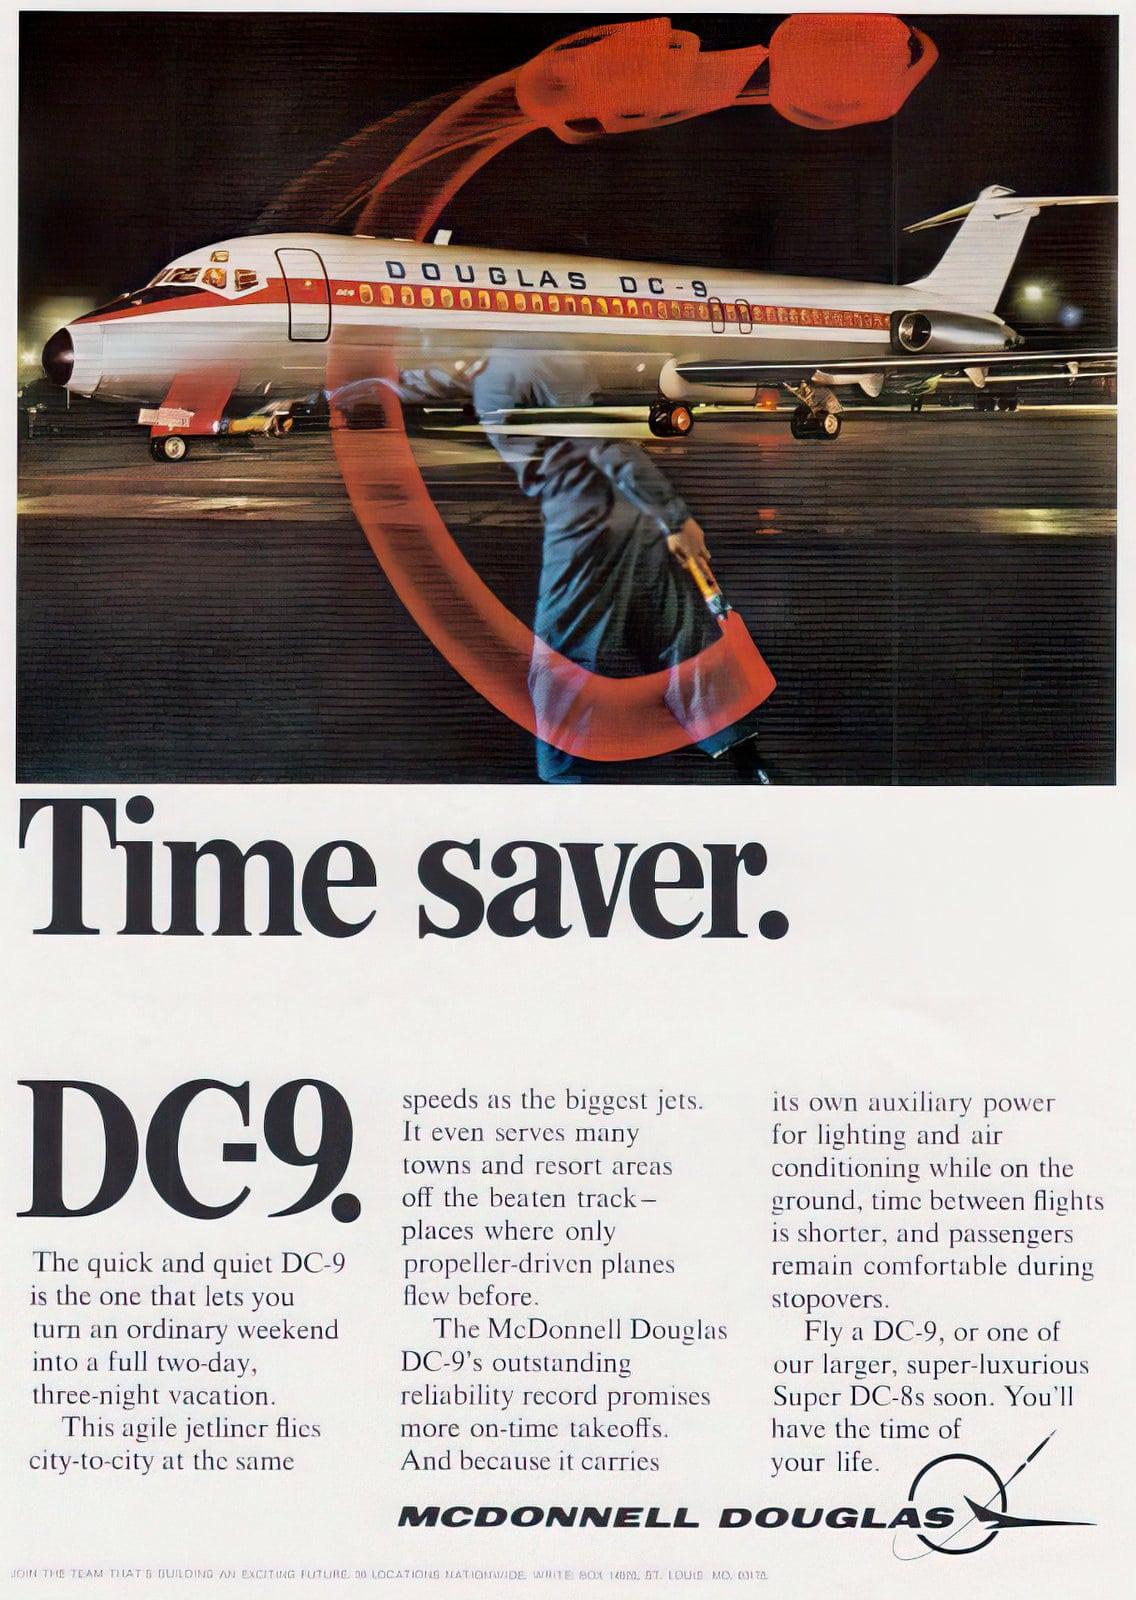 Vintage DC-9 plane - TIme saver - 1960s